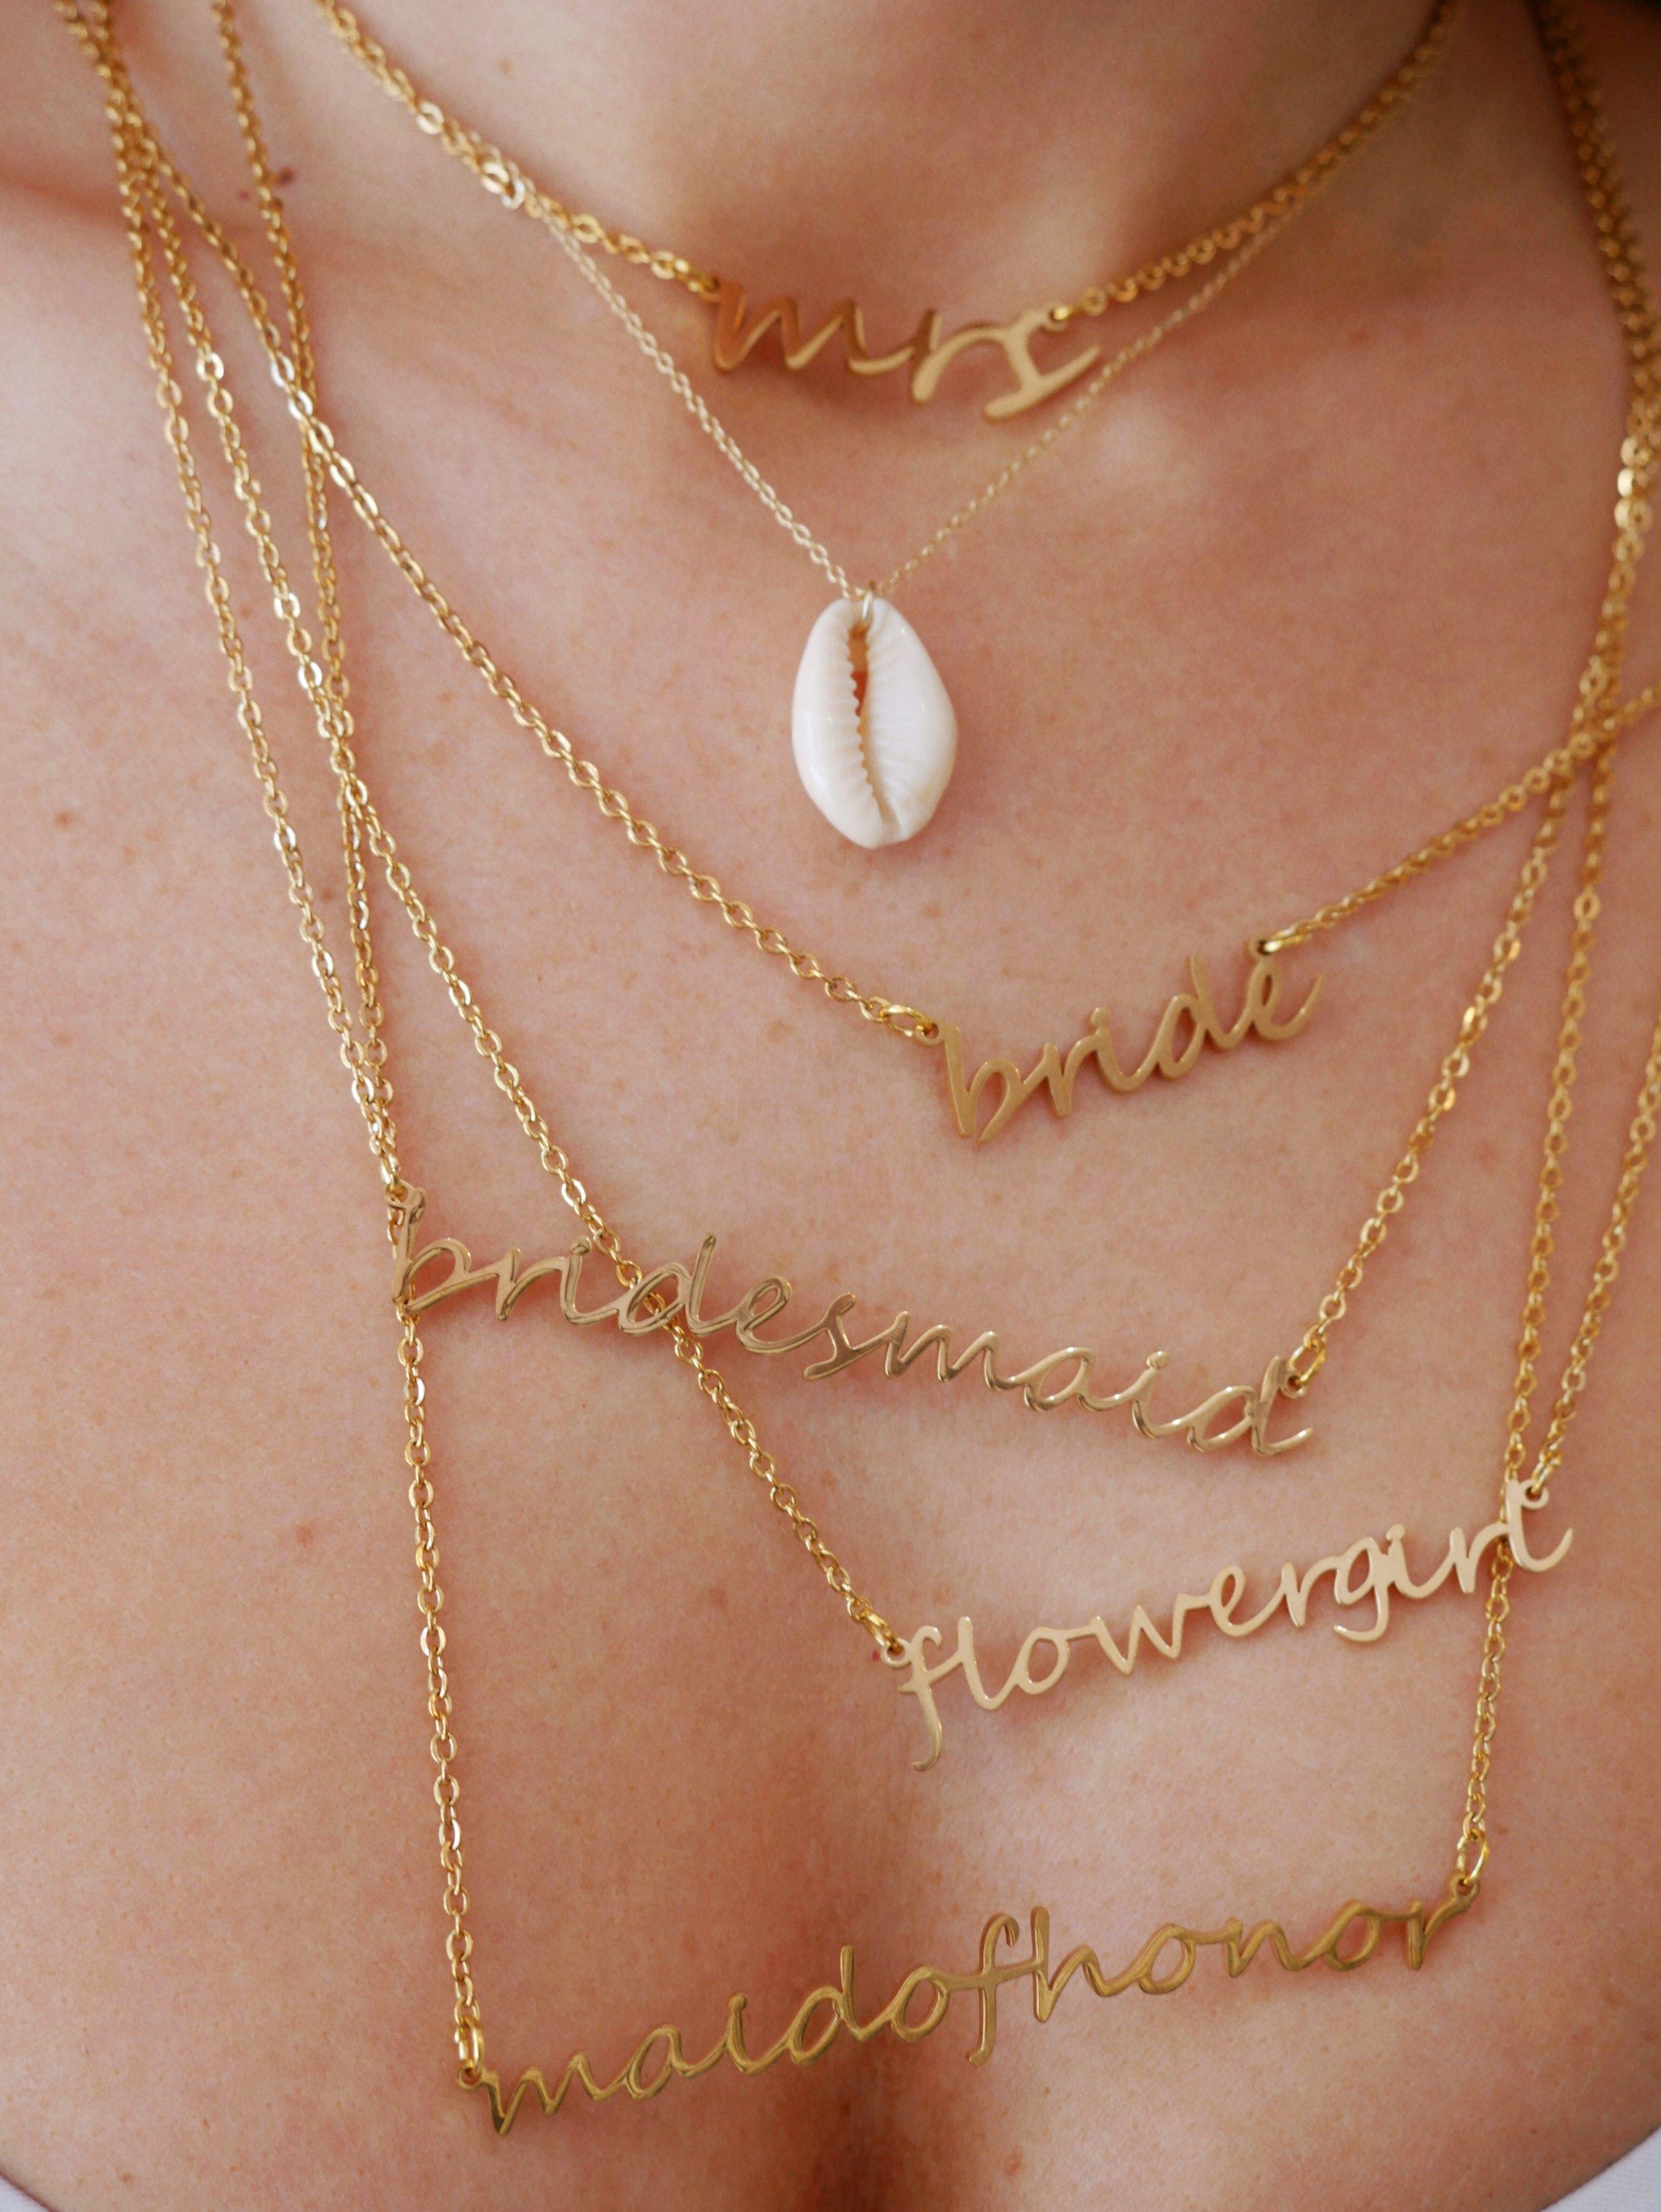 wedding party necklace customized.JPG